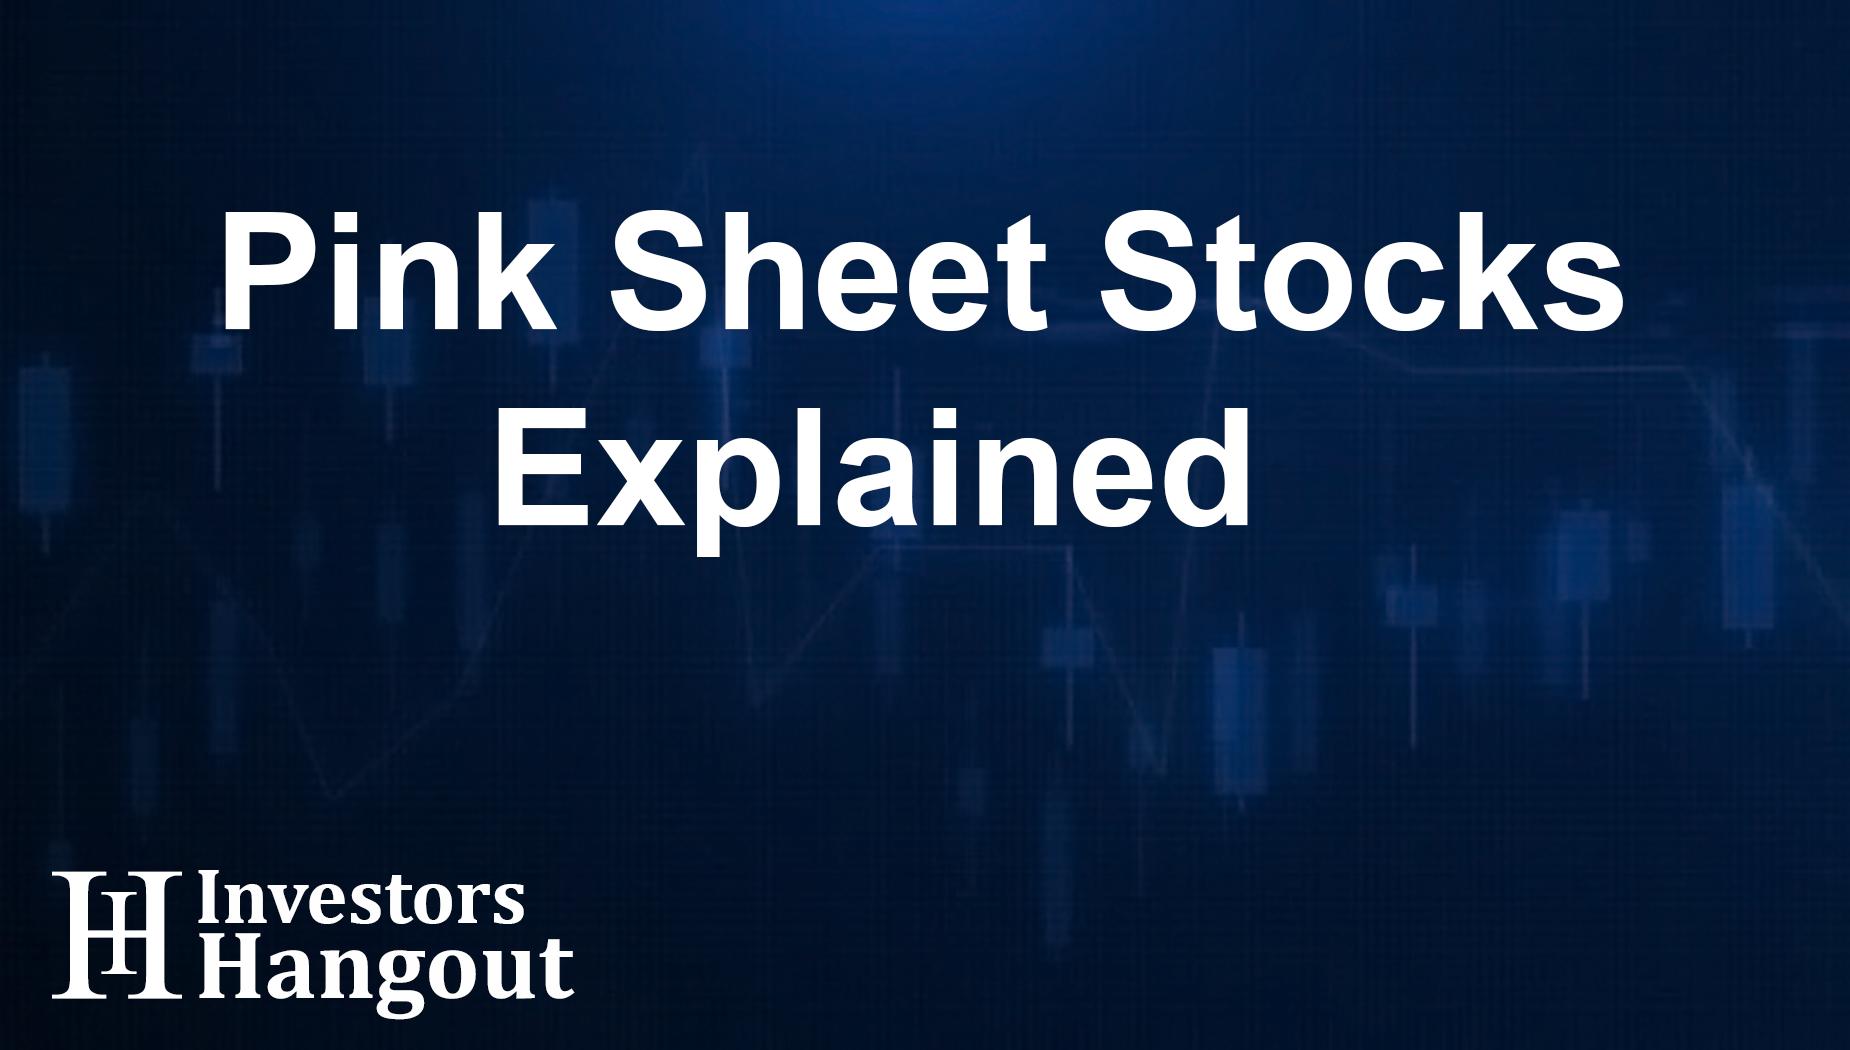 Pink Sheet Stocks Explained